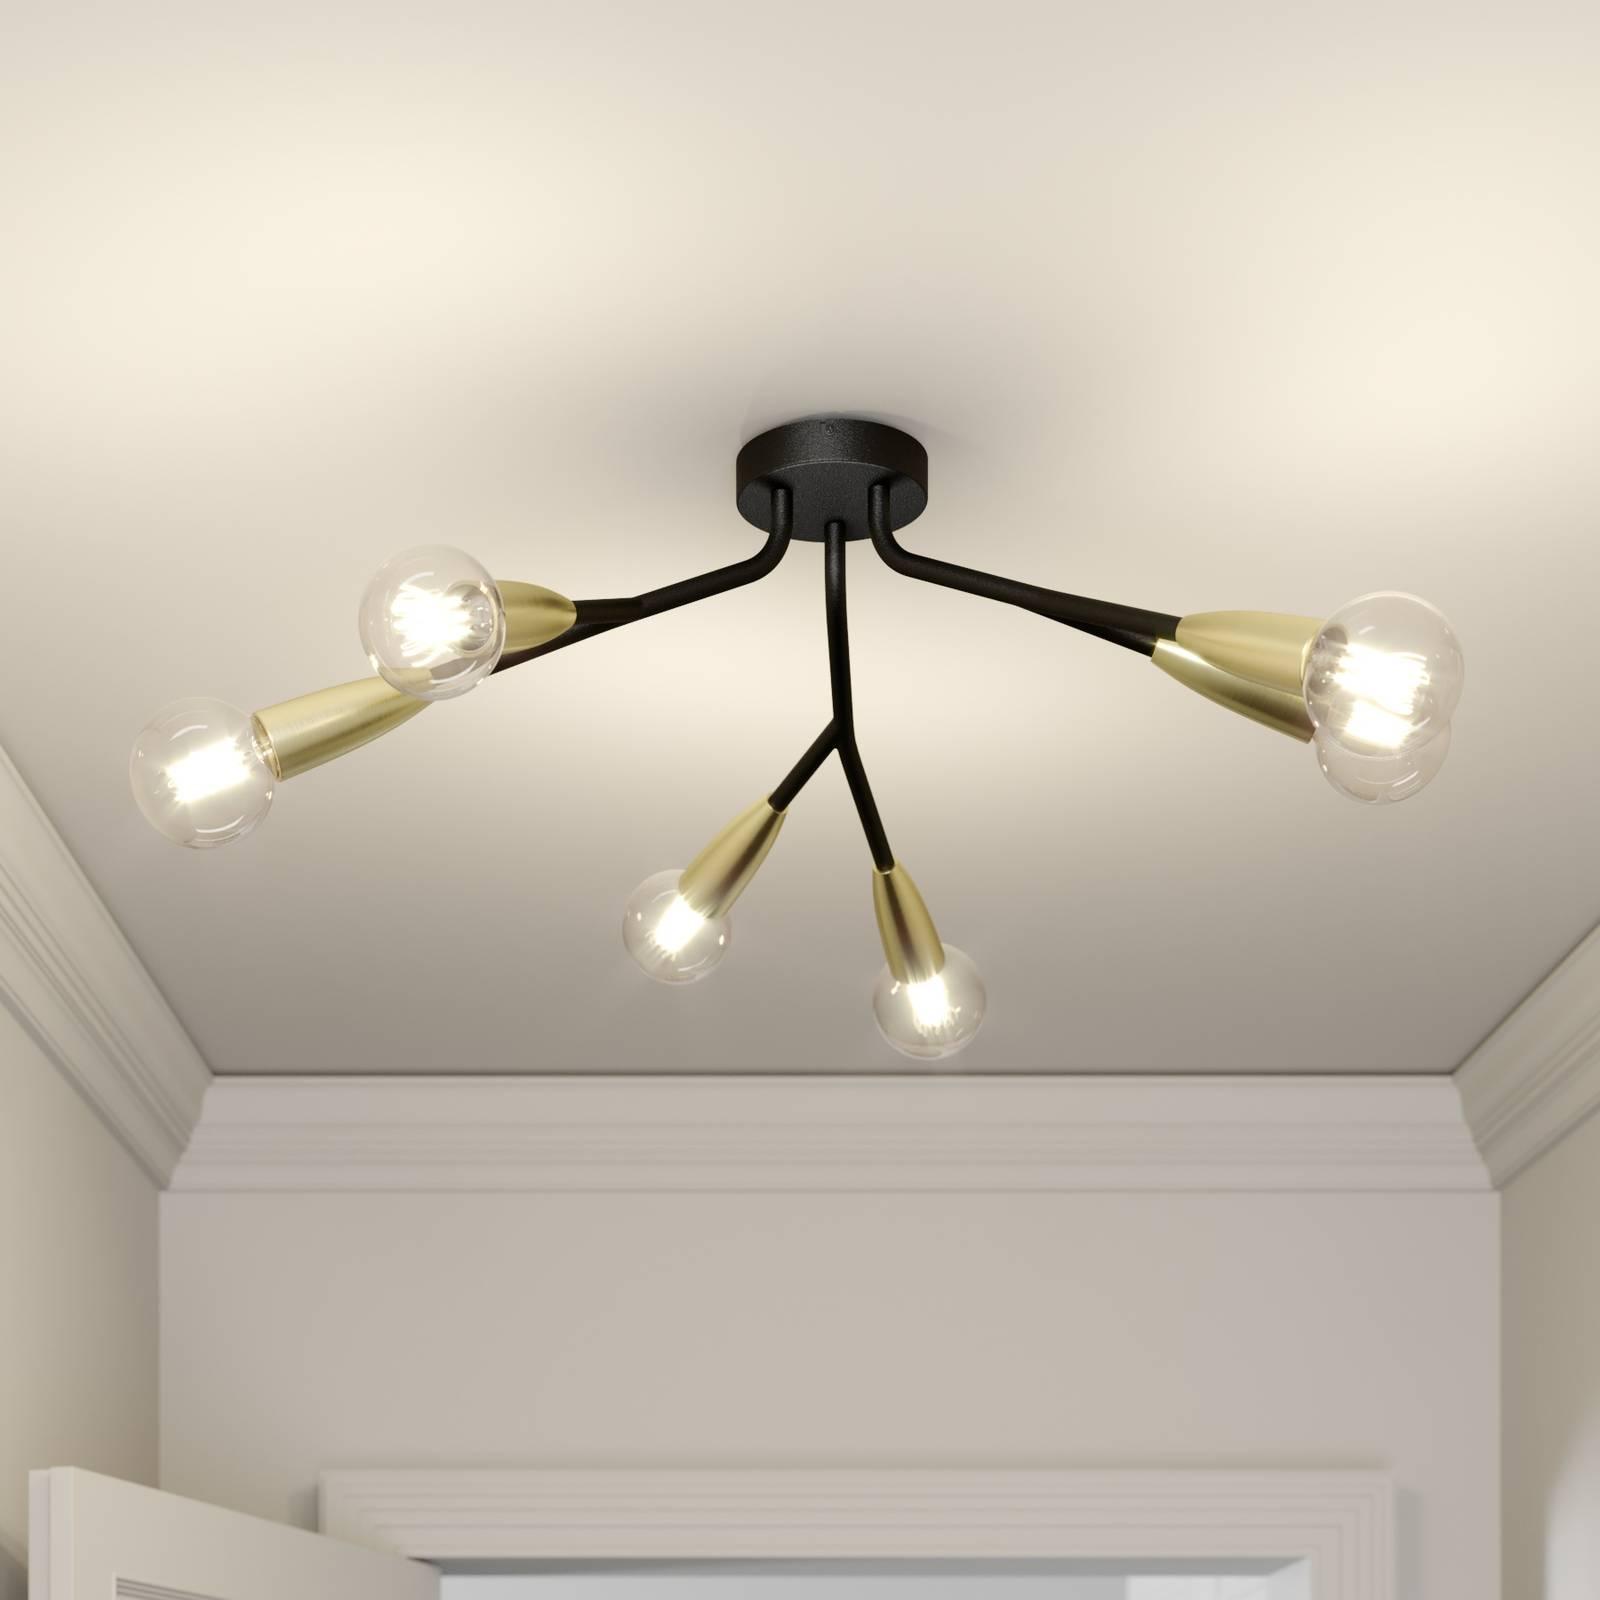 Lucande Carlea plafondlamp, 6-lamps zwart messing